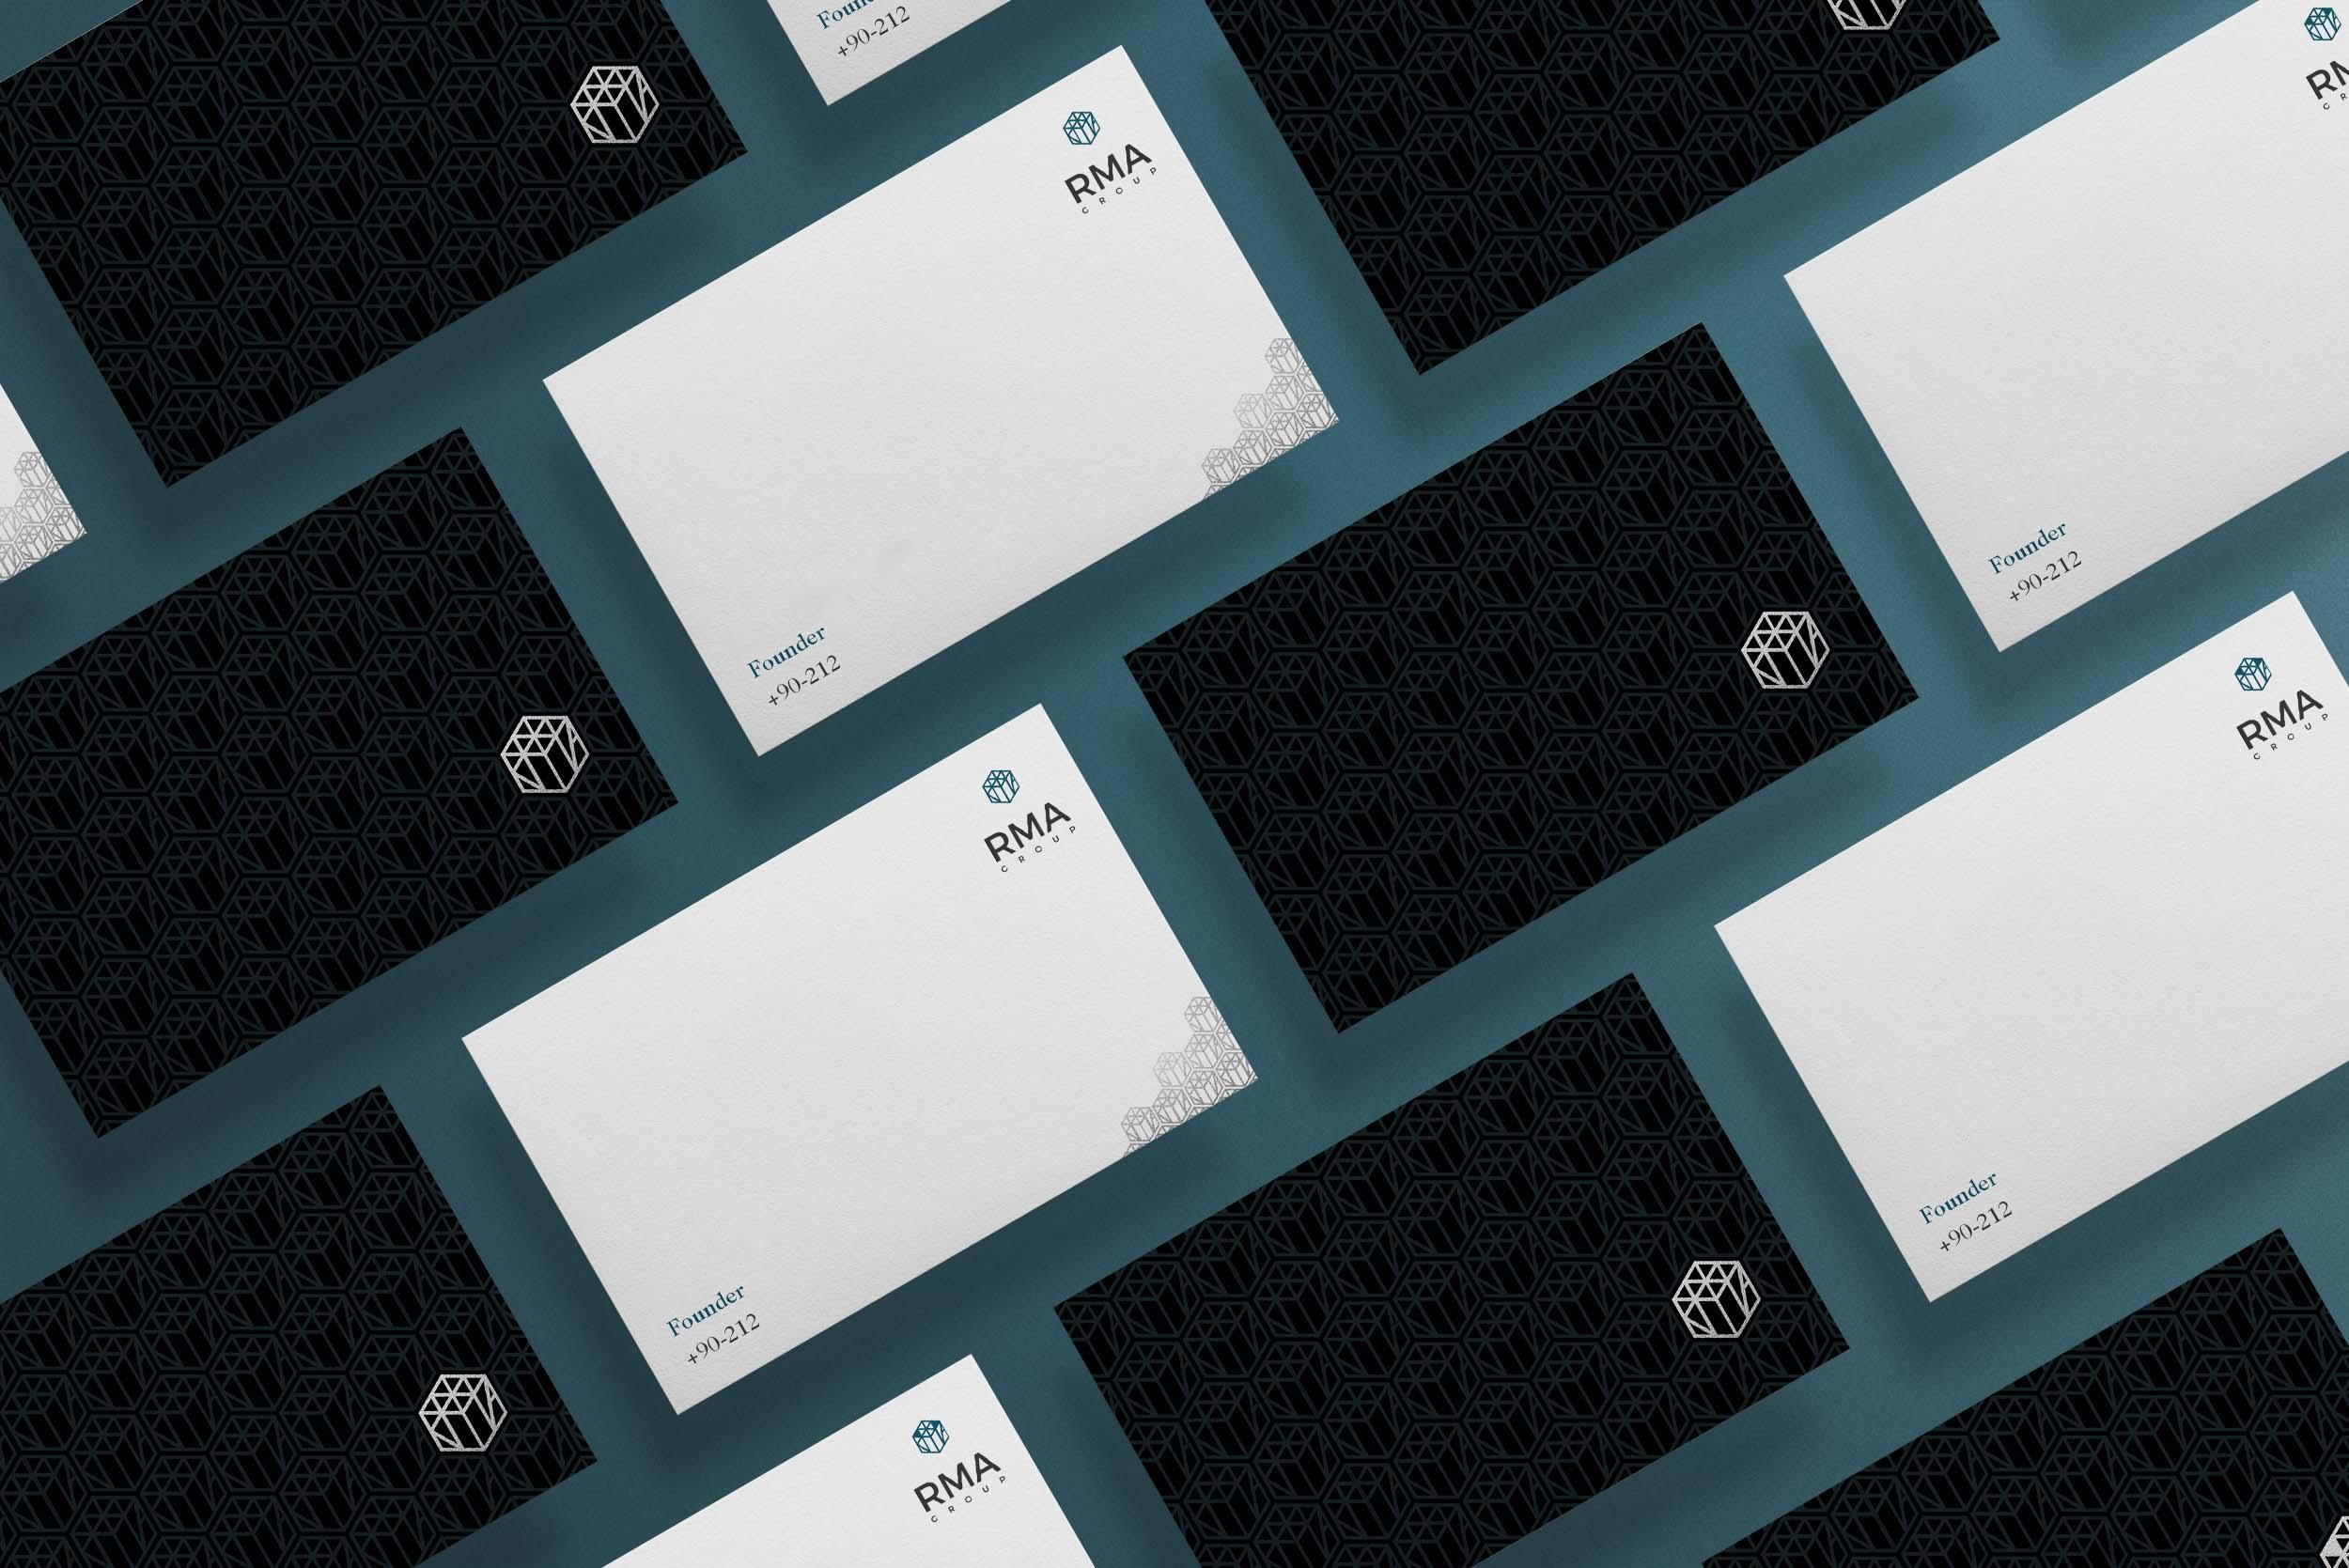 06-stationery-corporate-mockup-inter-size.jpg